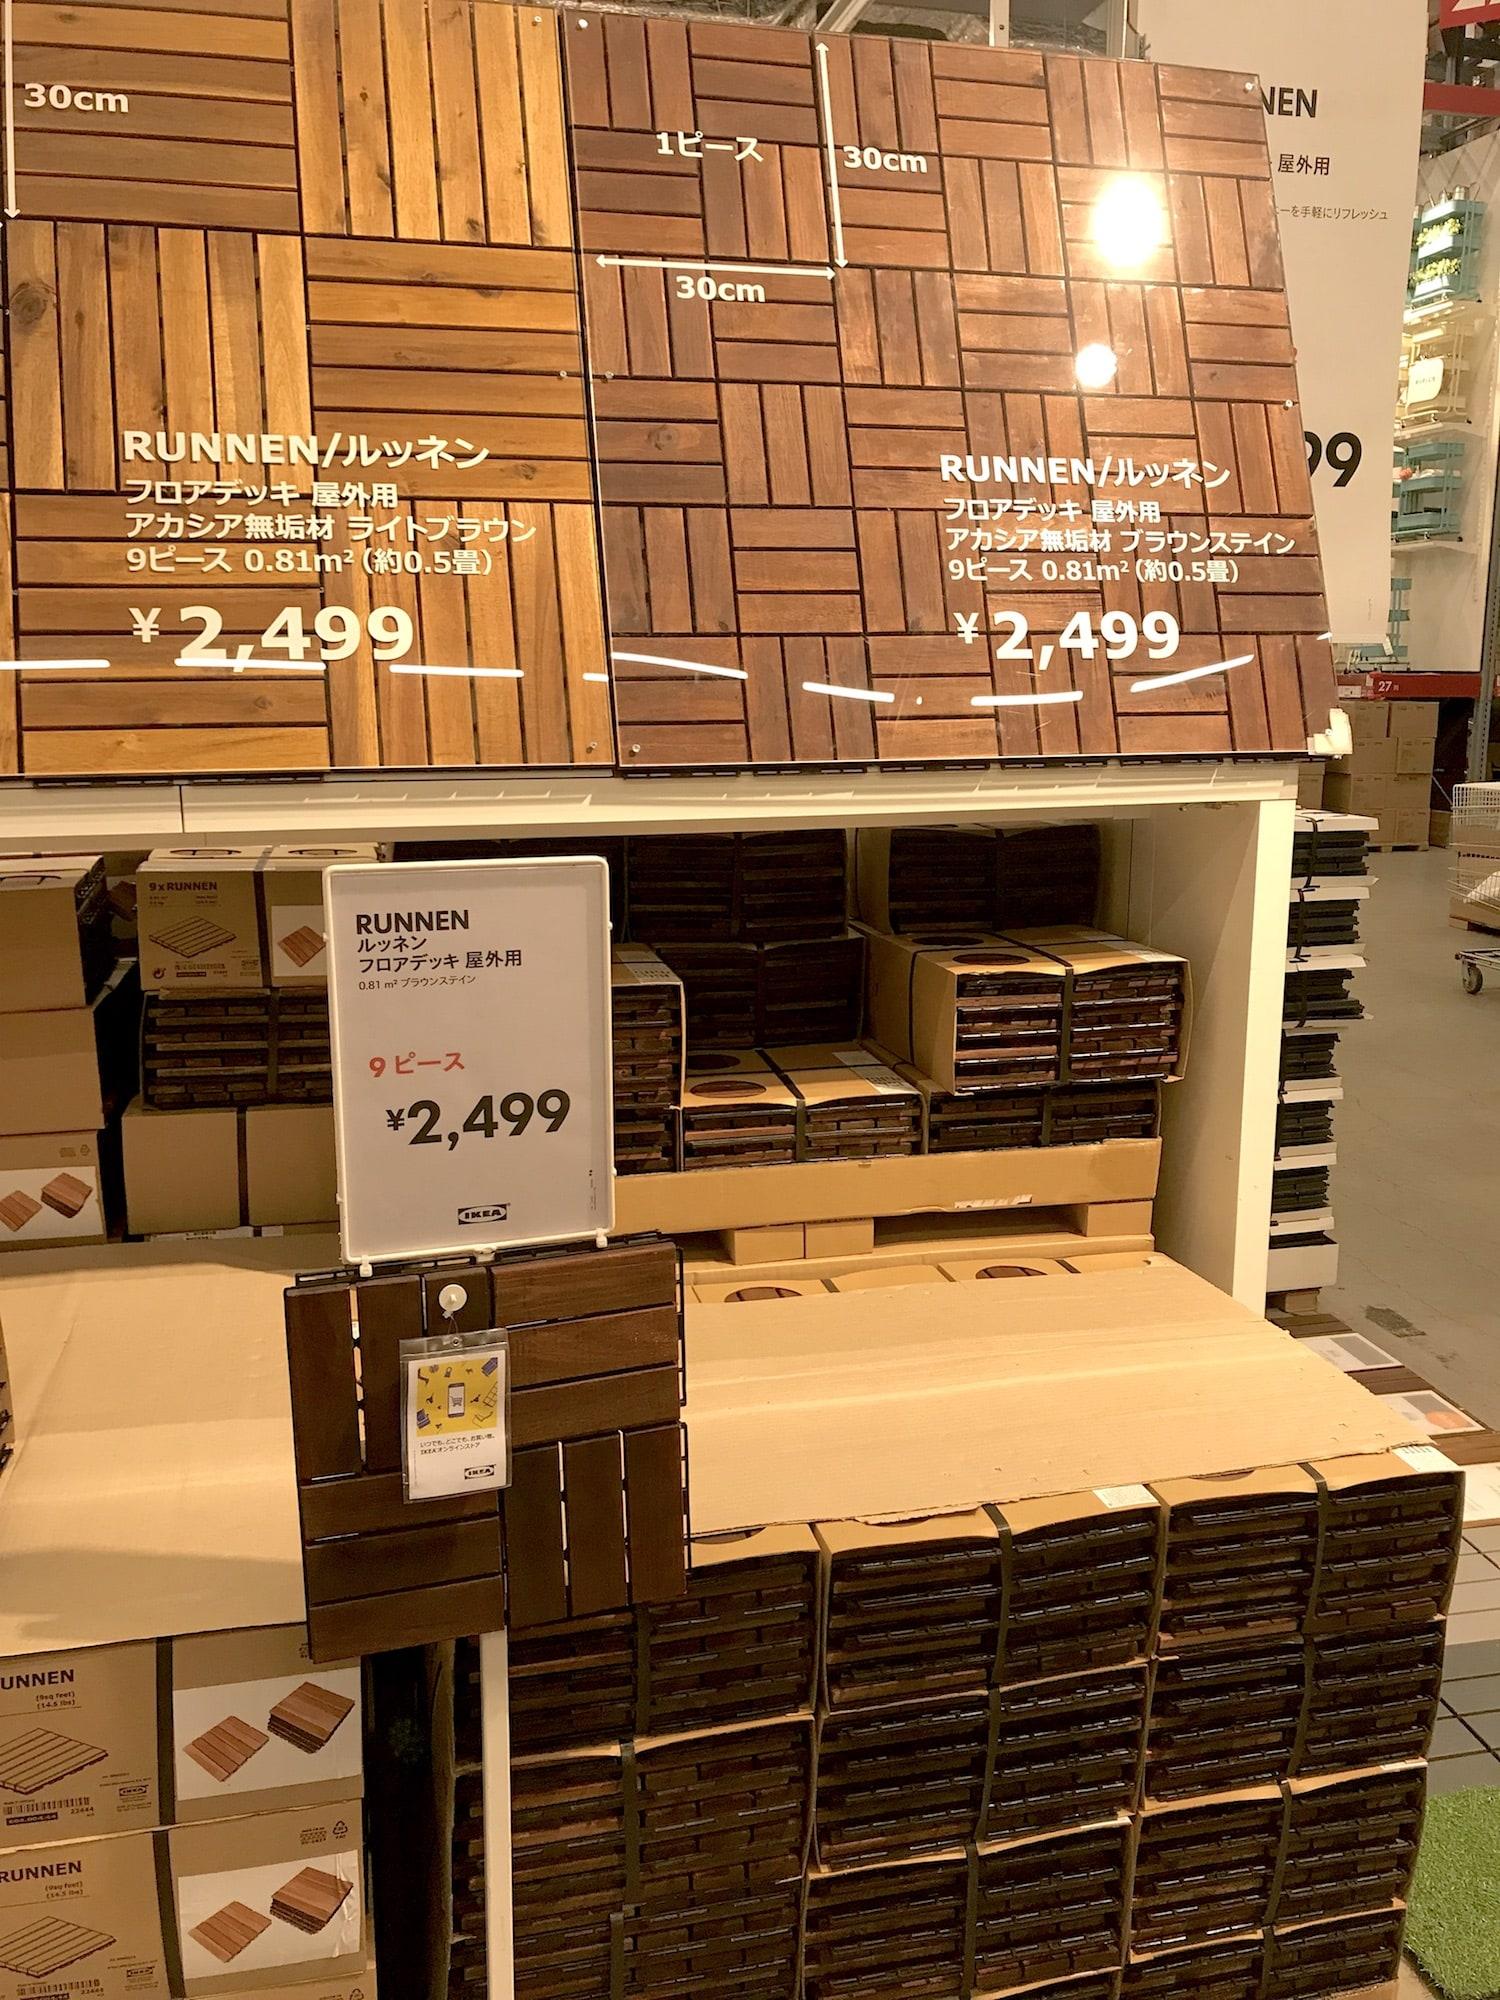 IKEAのウッドデッキの商品売場の写真